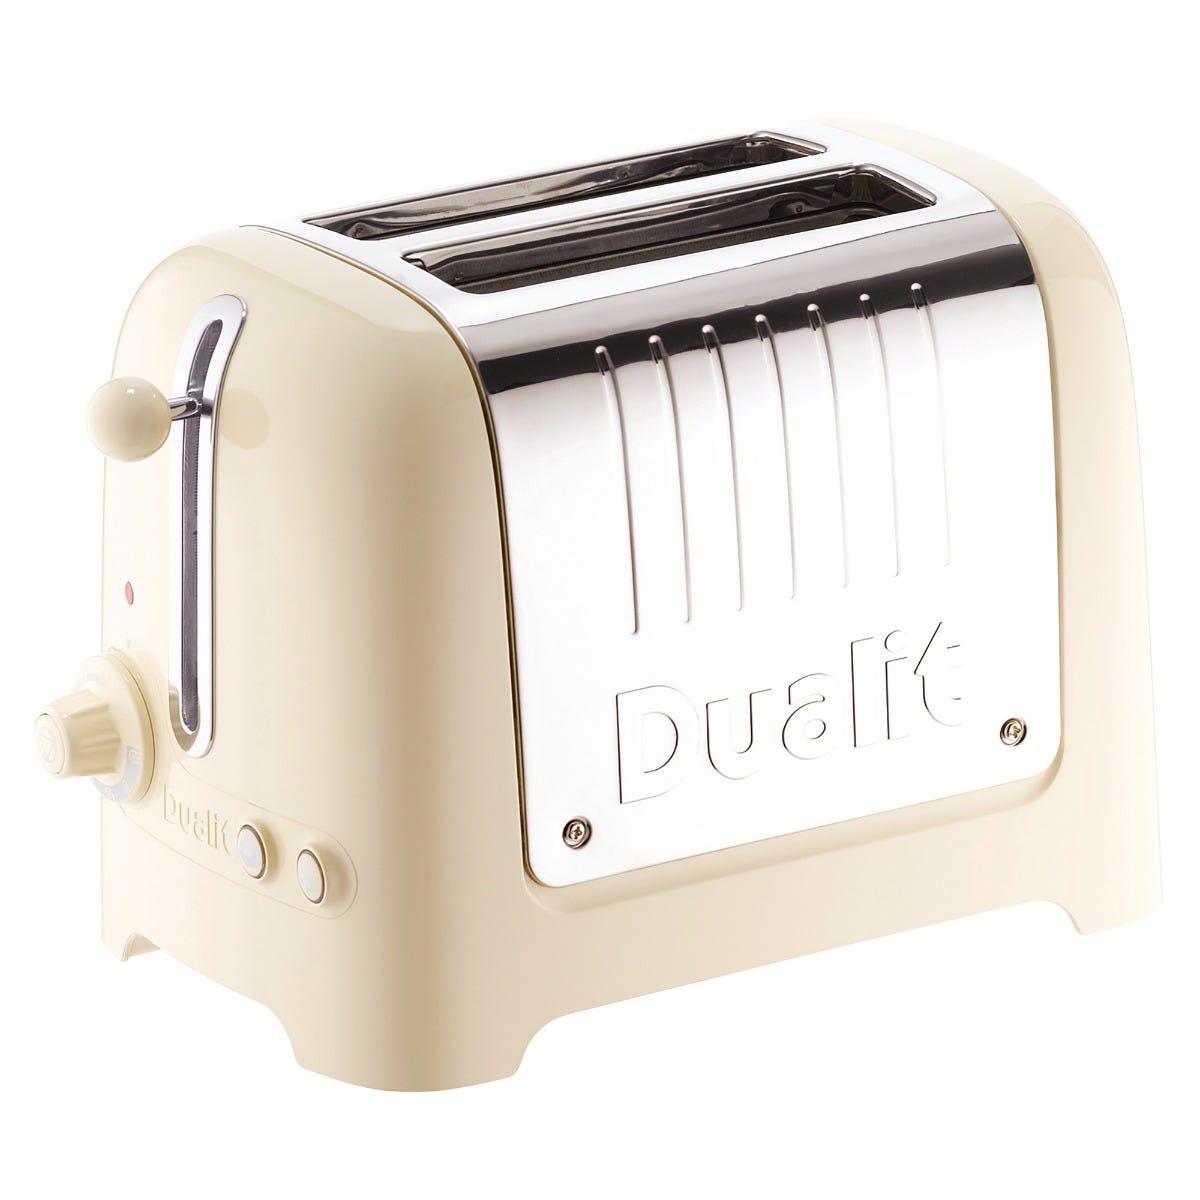 Dualit 26202 2-Slice Lite Toaster - Cream